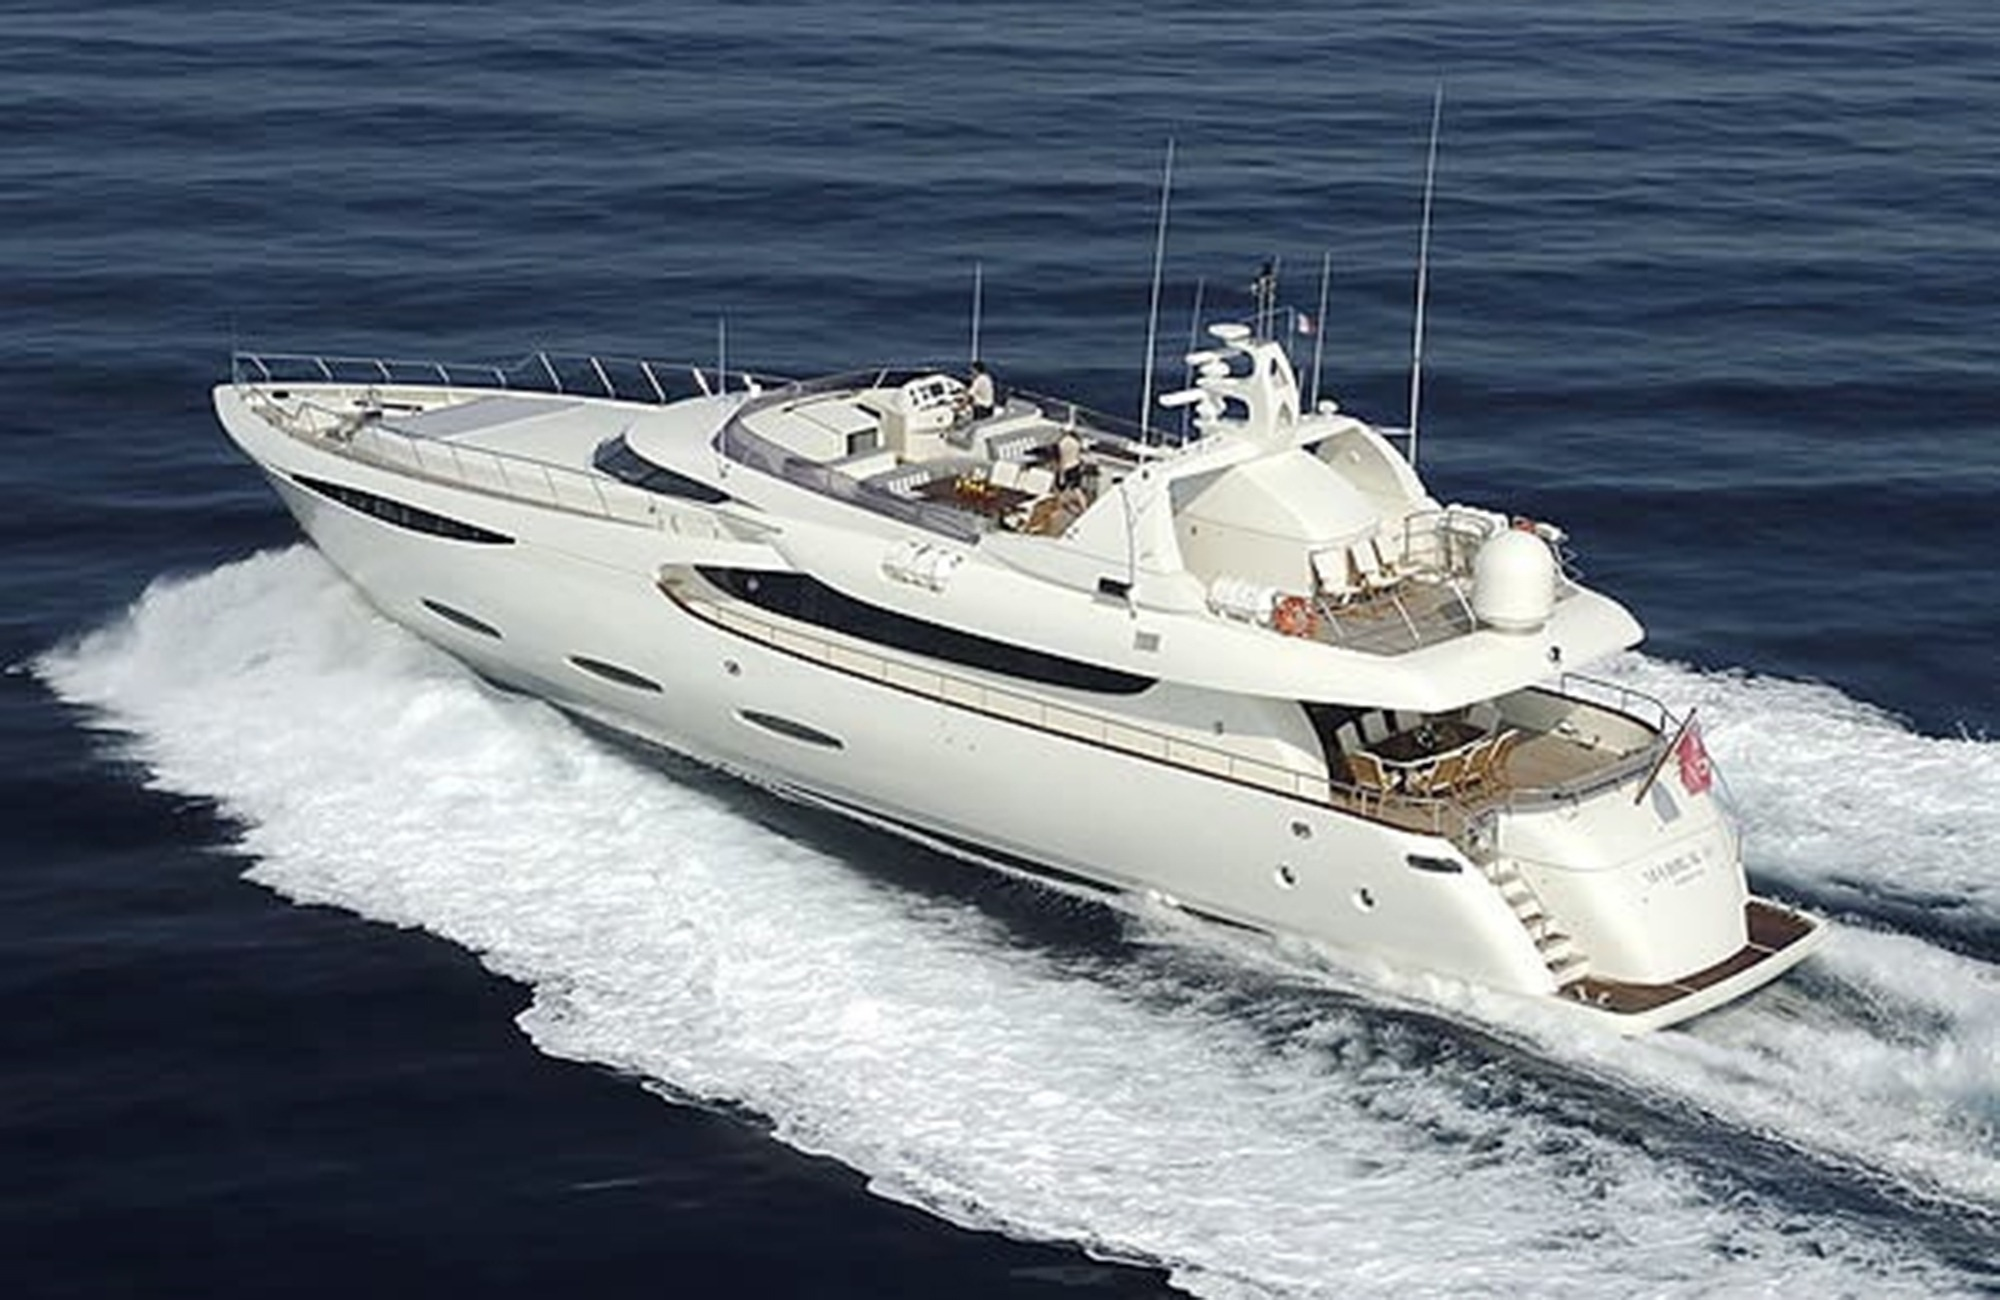 35m Mabruk III is a mini-superyacht